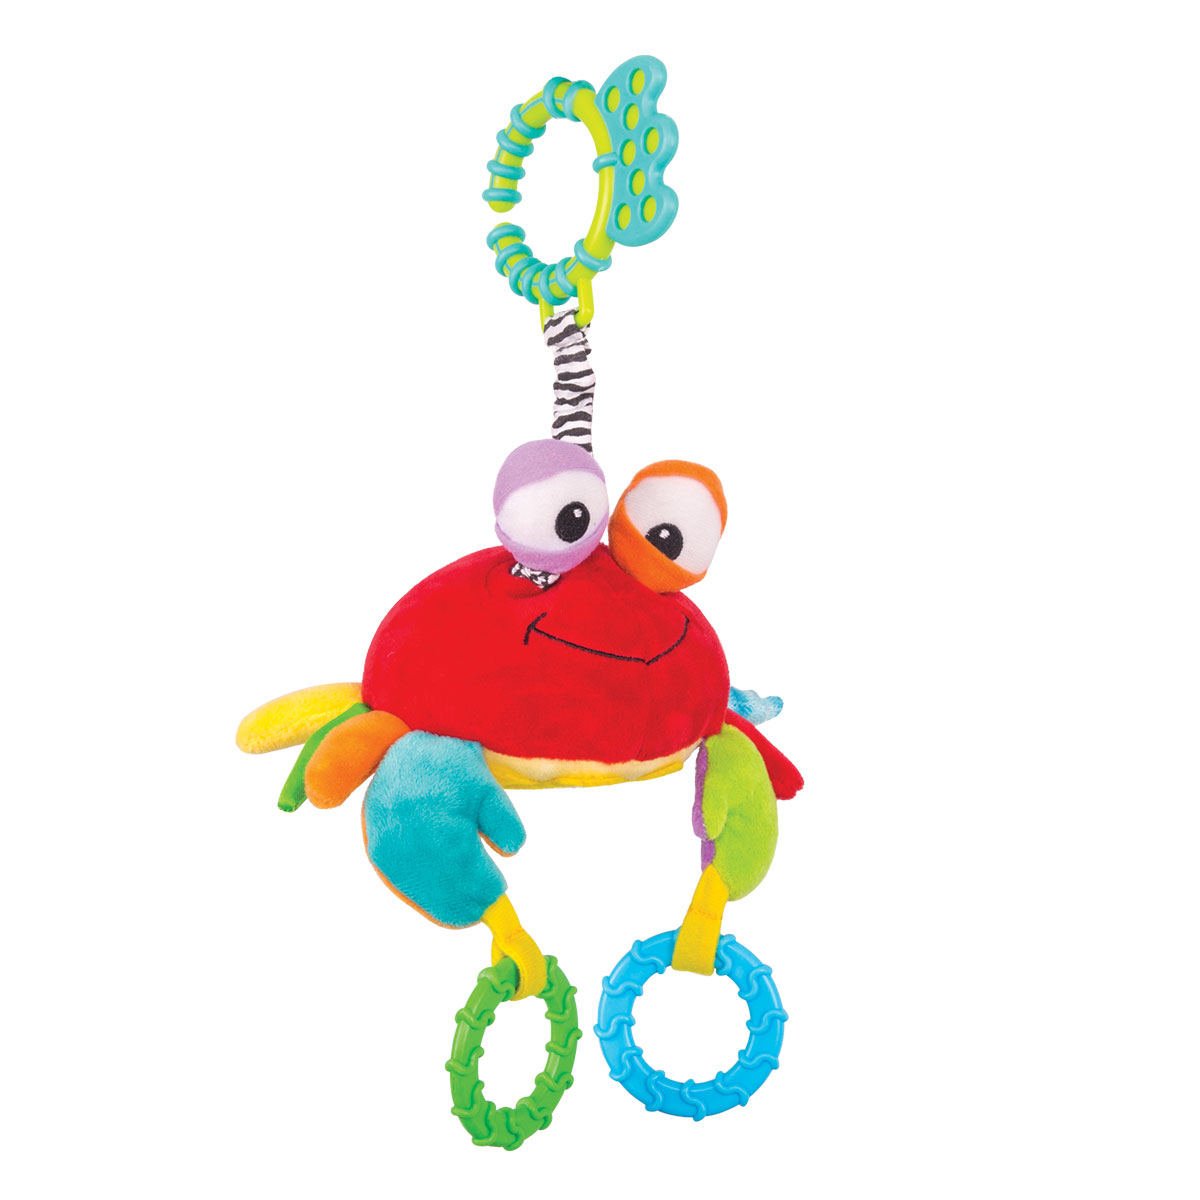 Happy Snail Игрушка-подвеска Краб Чарми golden snail 72v60v